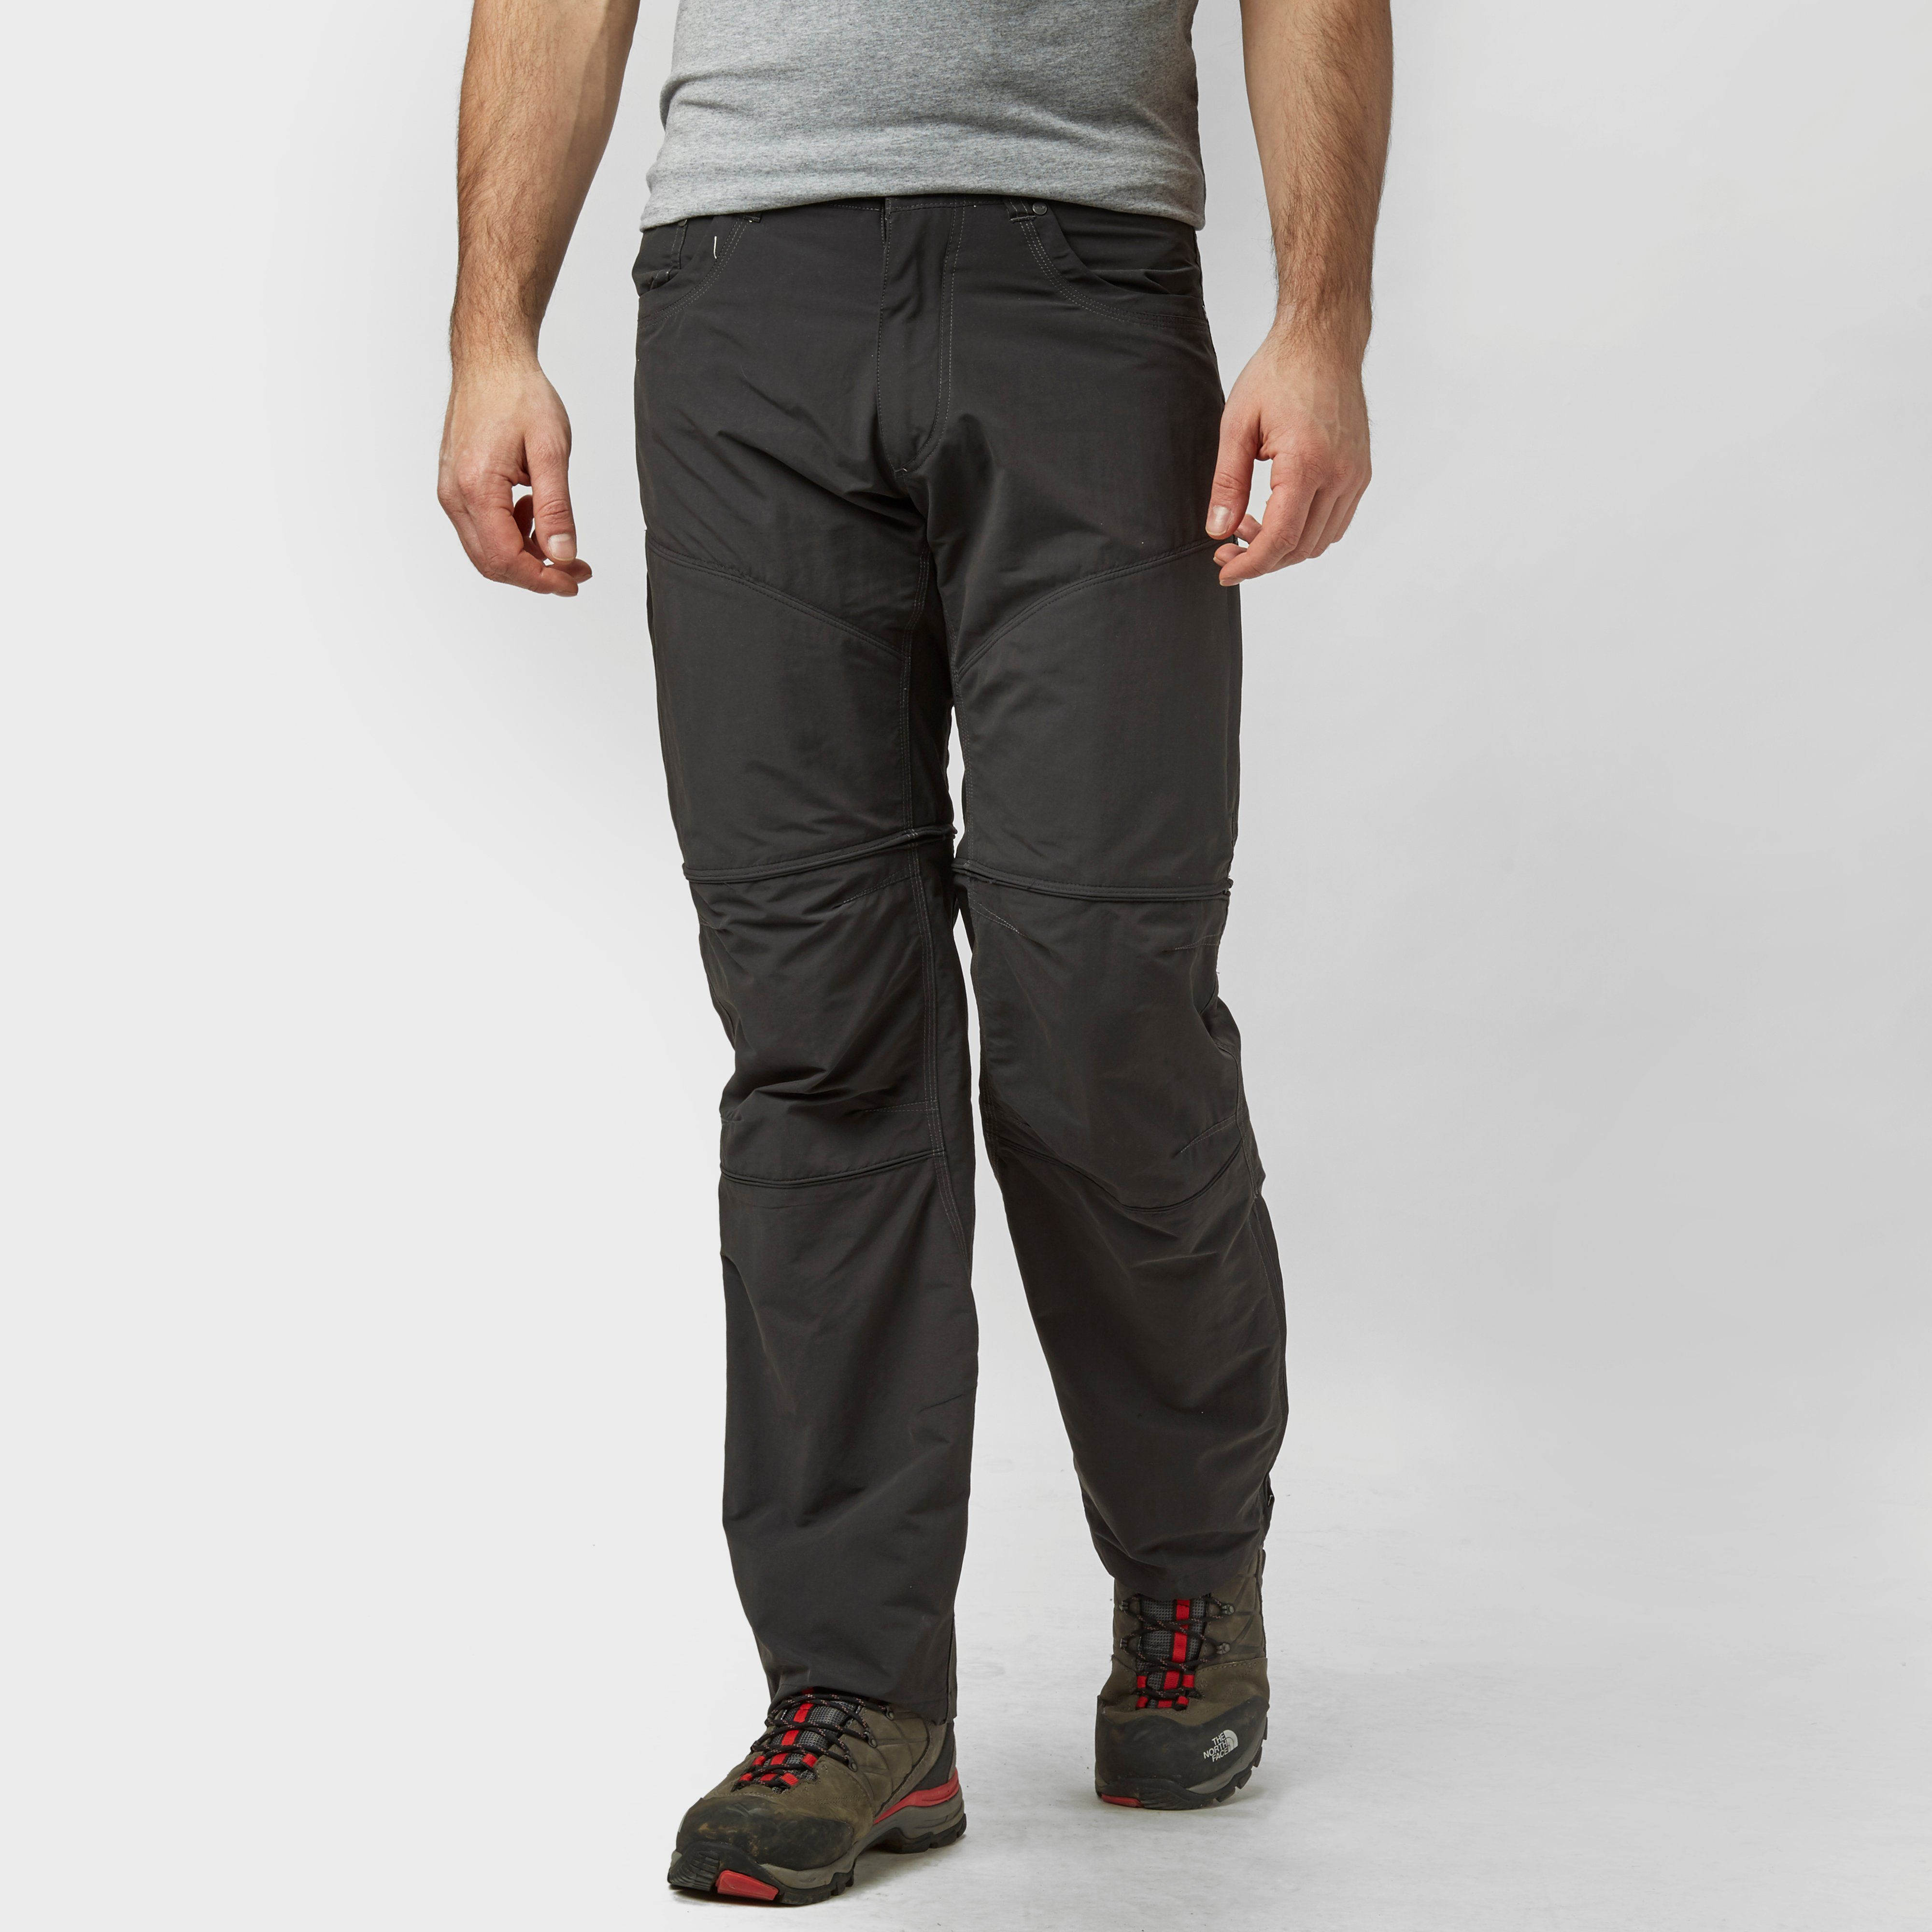 KUHL Men's Liberator Convertible Pants